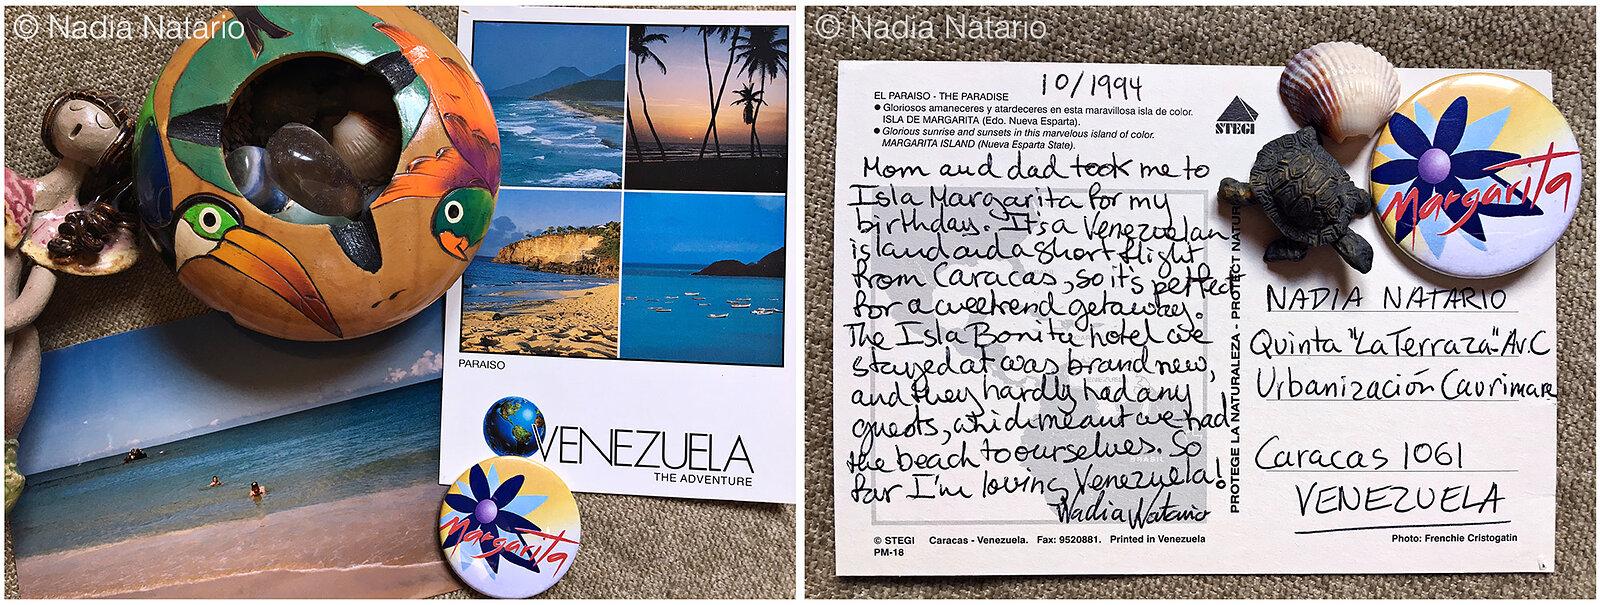 Postcards to Myself - Isla Margarita, Venezuela 1994